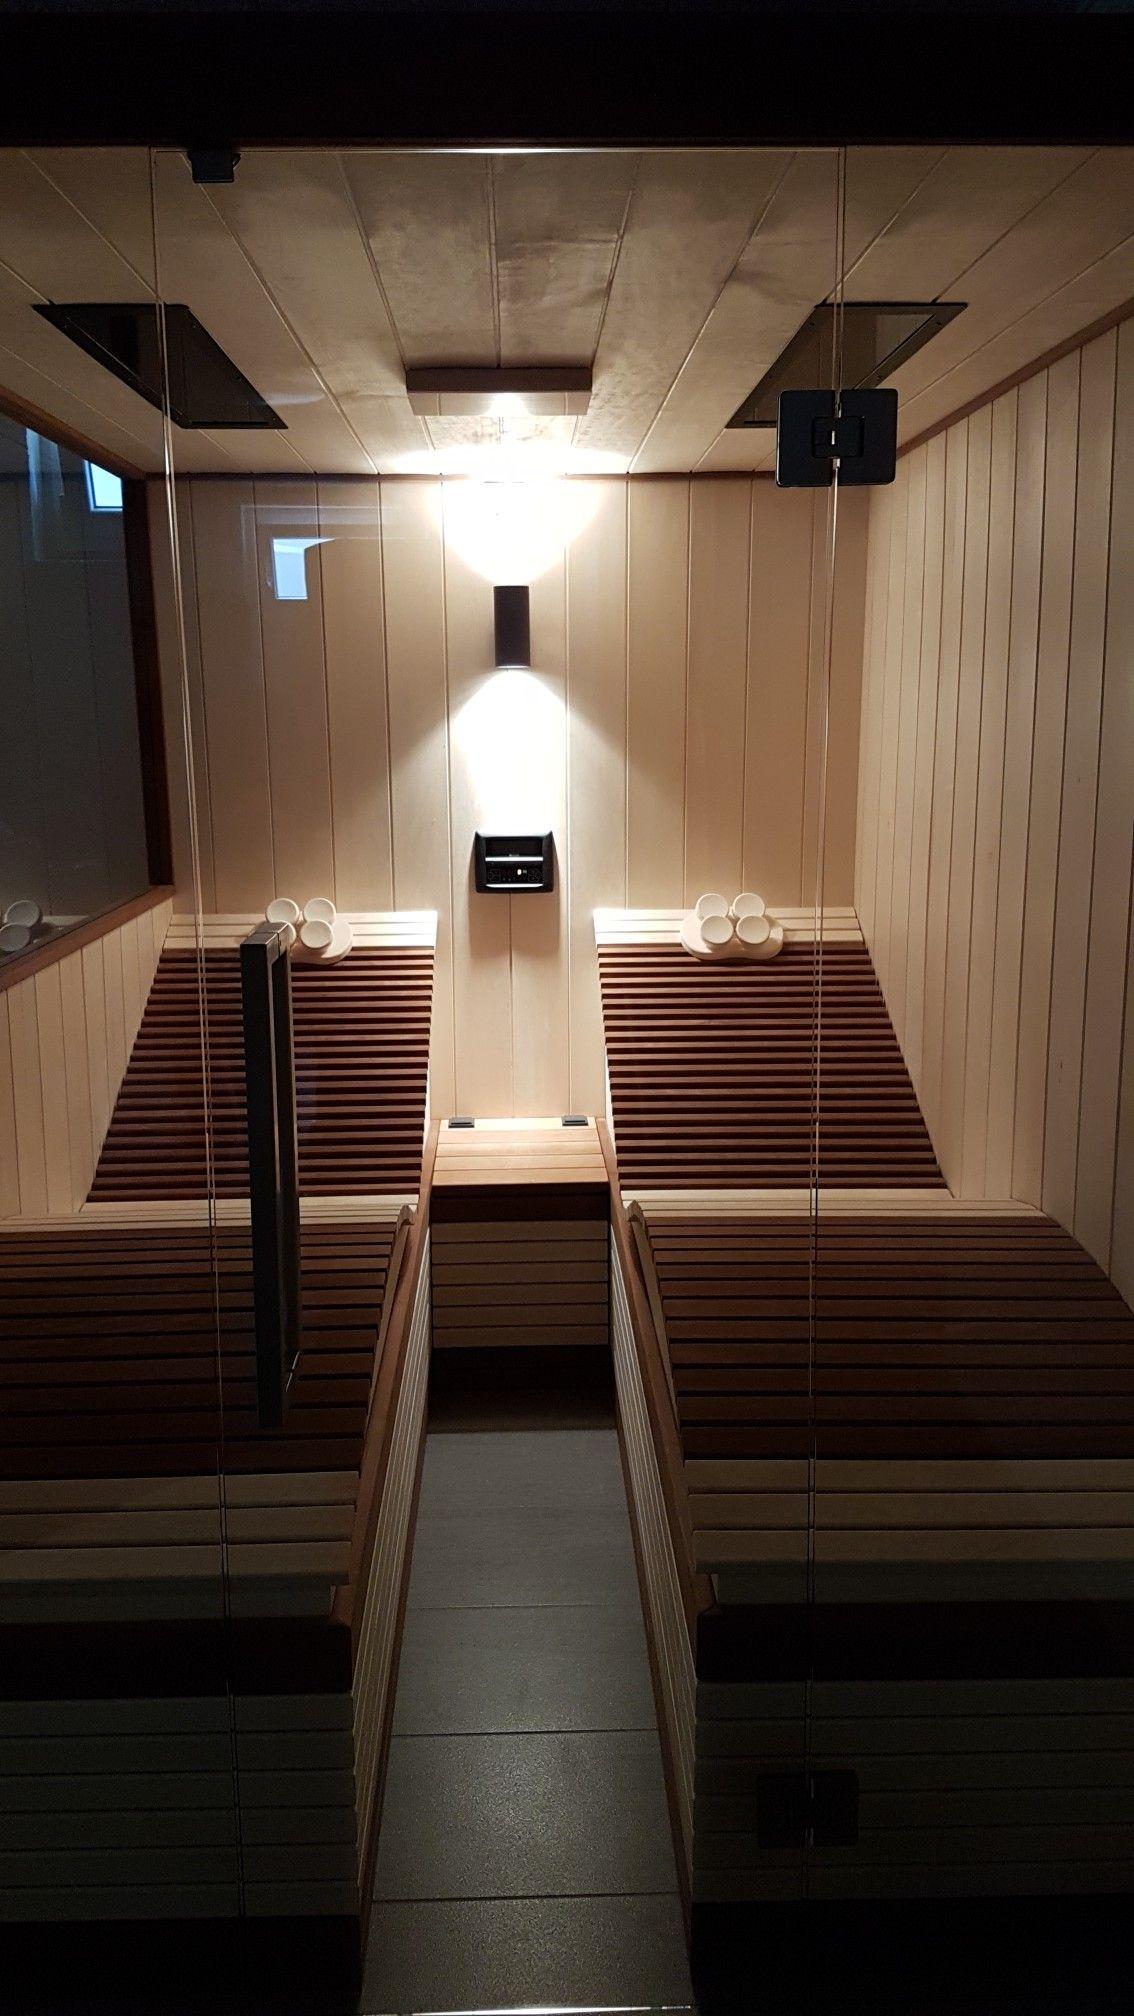 infrarotkabine mit ergonomischer liege f r 2 personen by enermed austria infrarotkabine by. Black Bedroom Furniture Sets. Home Design Ideas